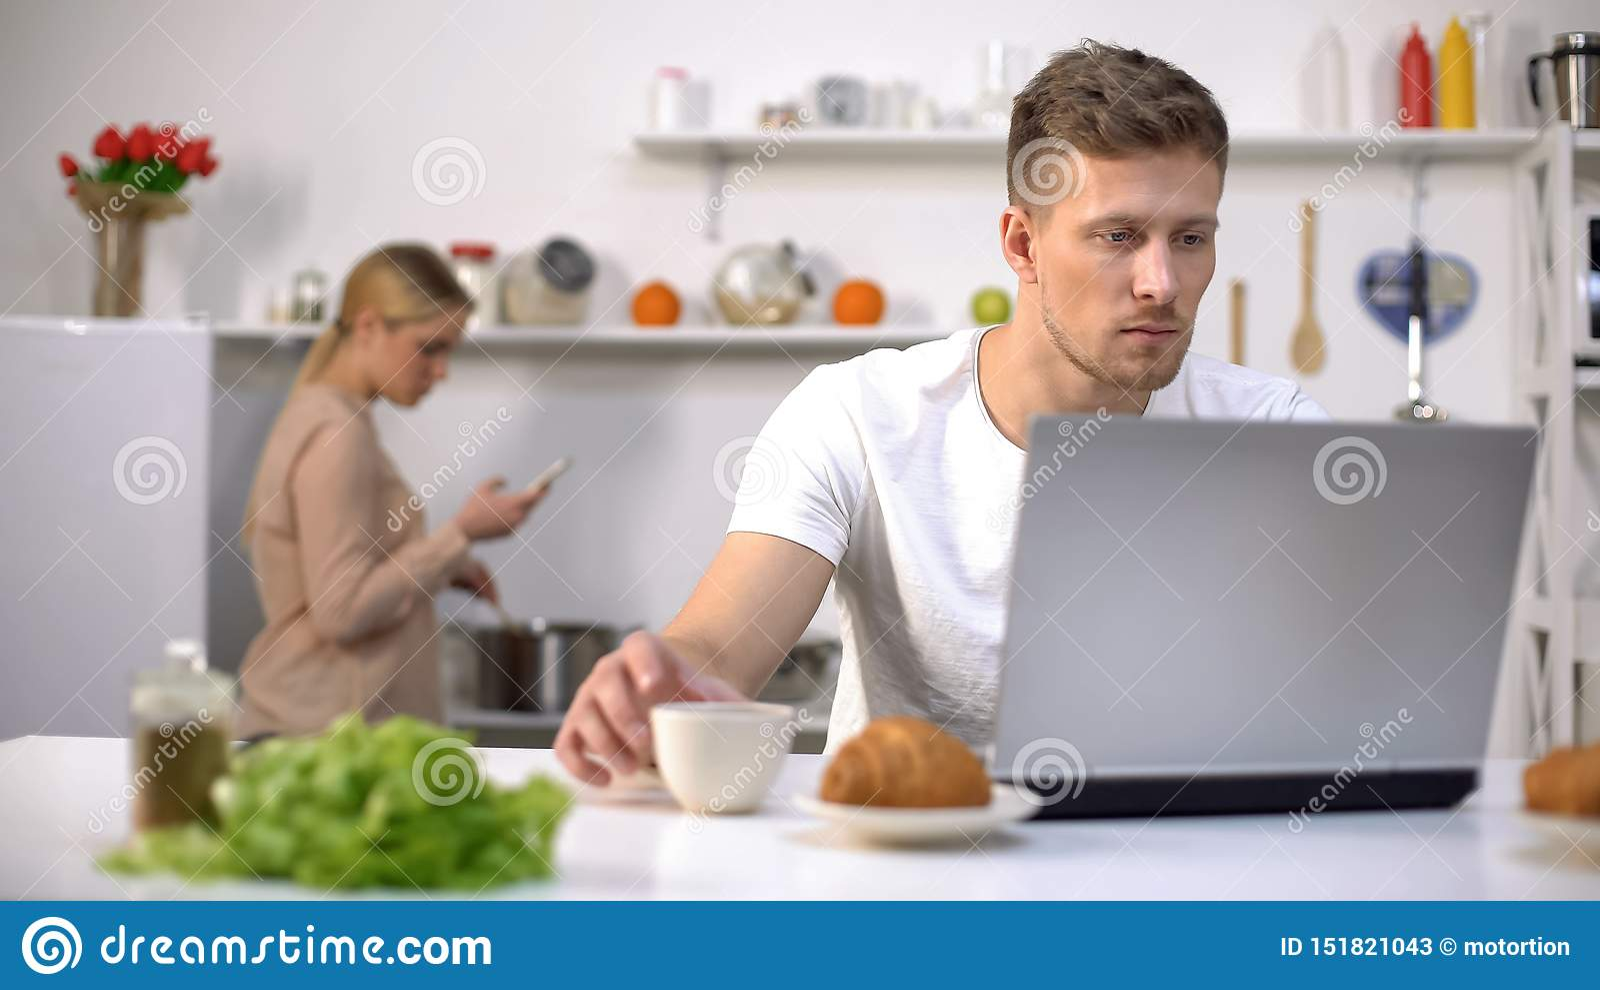 Paar die gadgets in keuken gebruiken, die levende mededeling, verslavingsconcept negeren